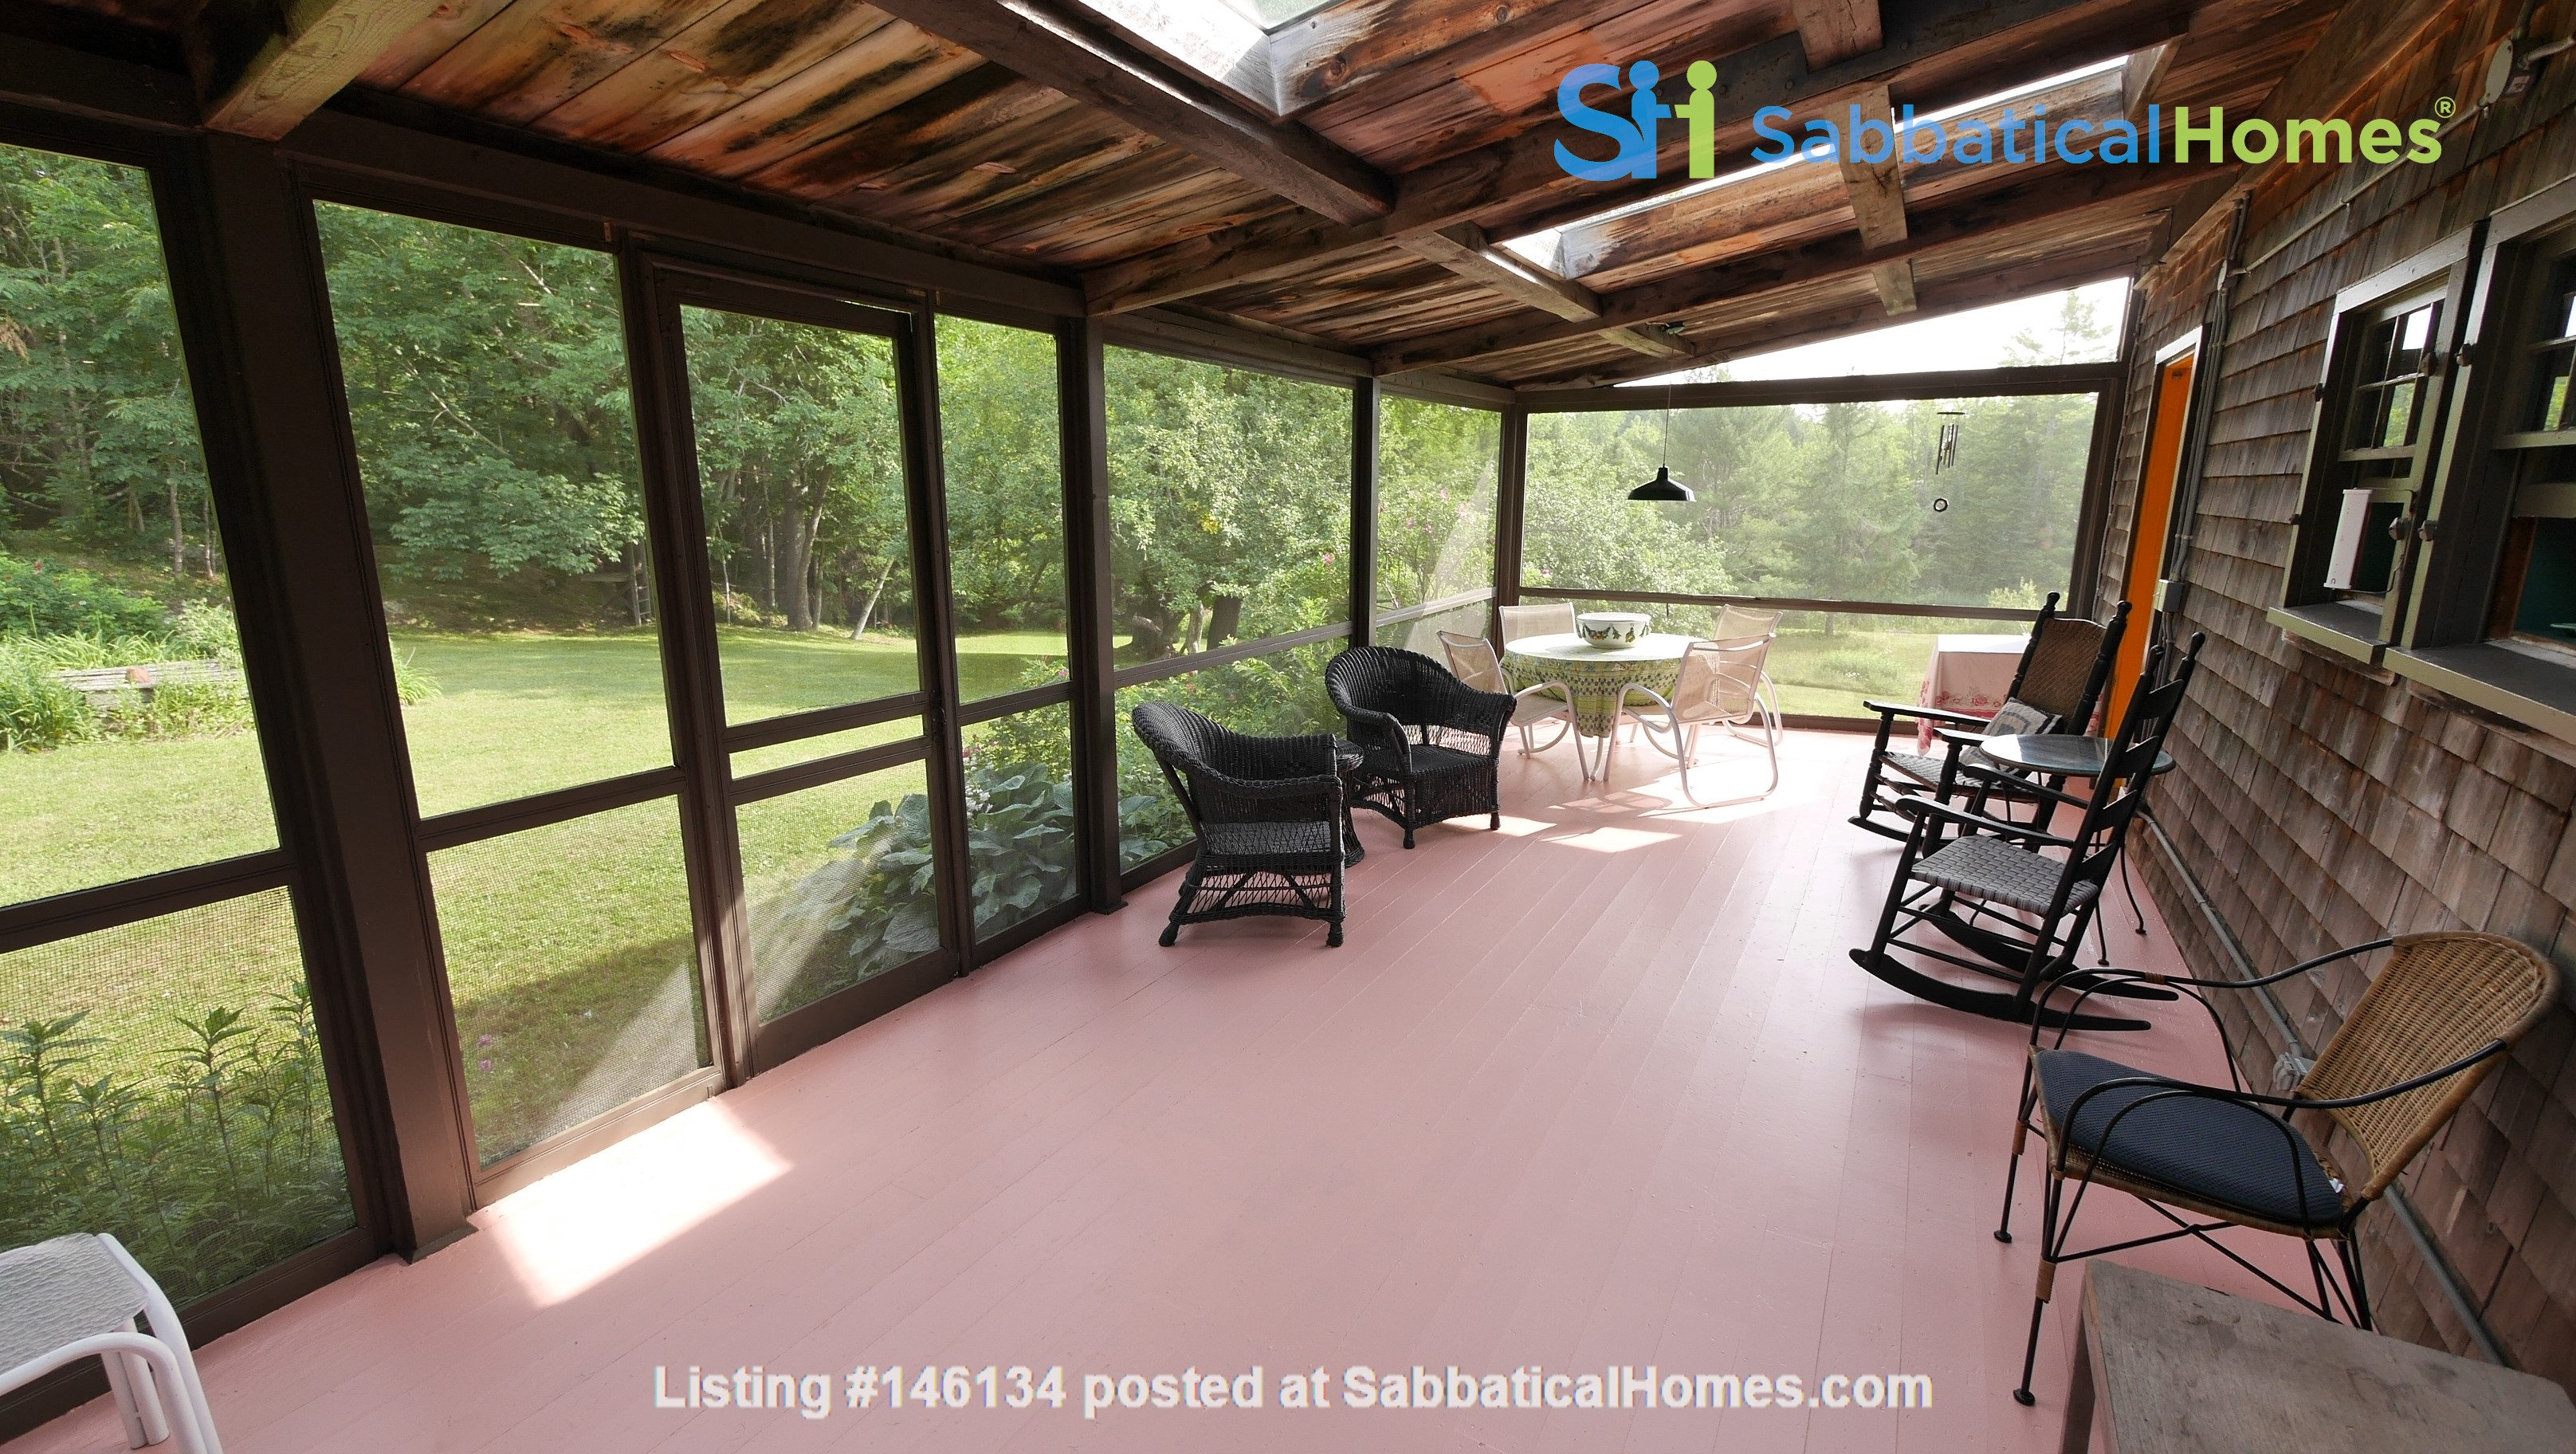 Idyllic Midcoast Maine Writer/Artist's Retreat Home Rental in Searsmont 4